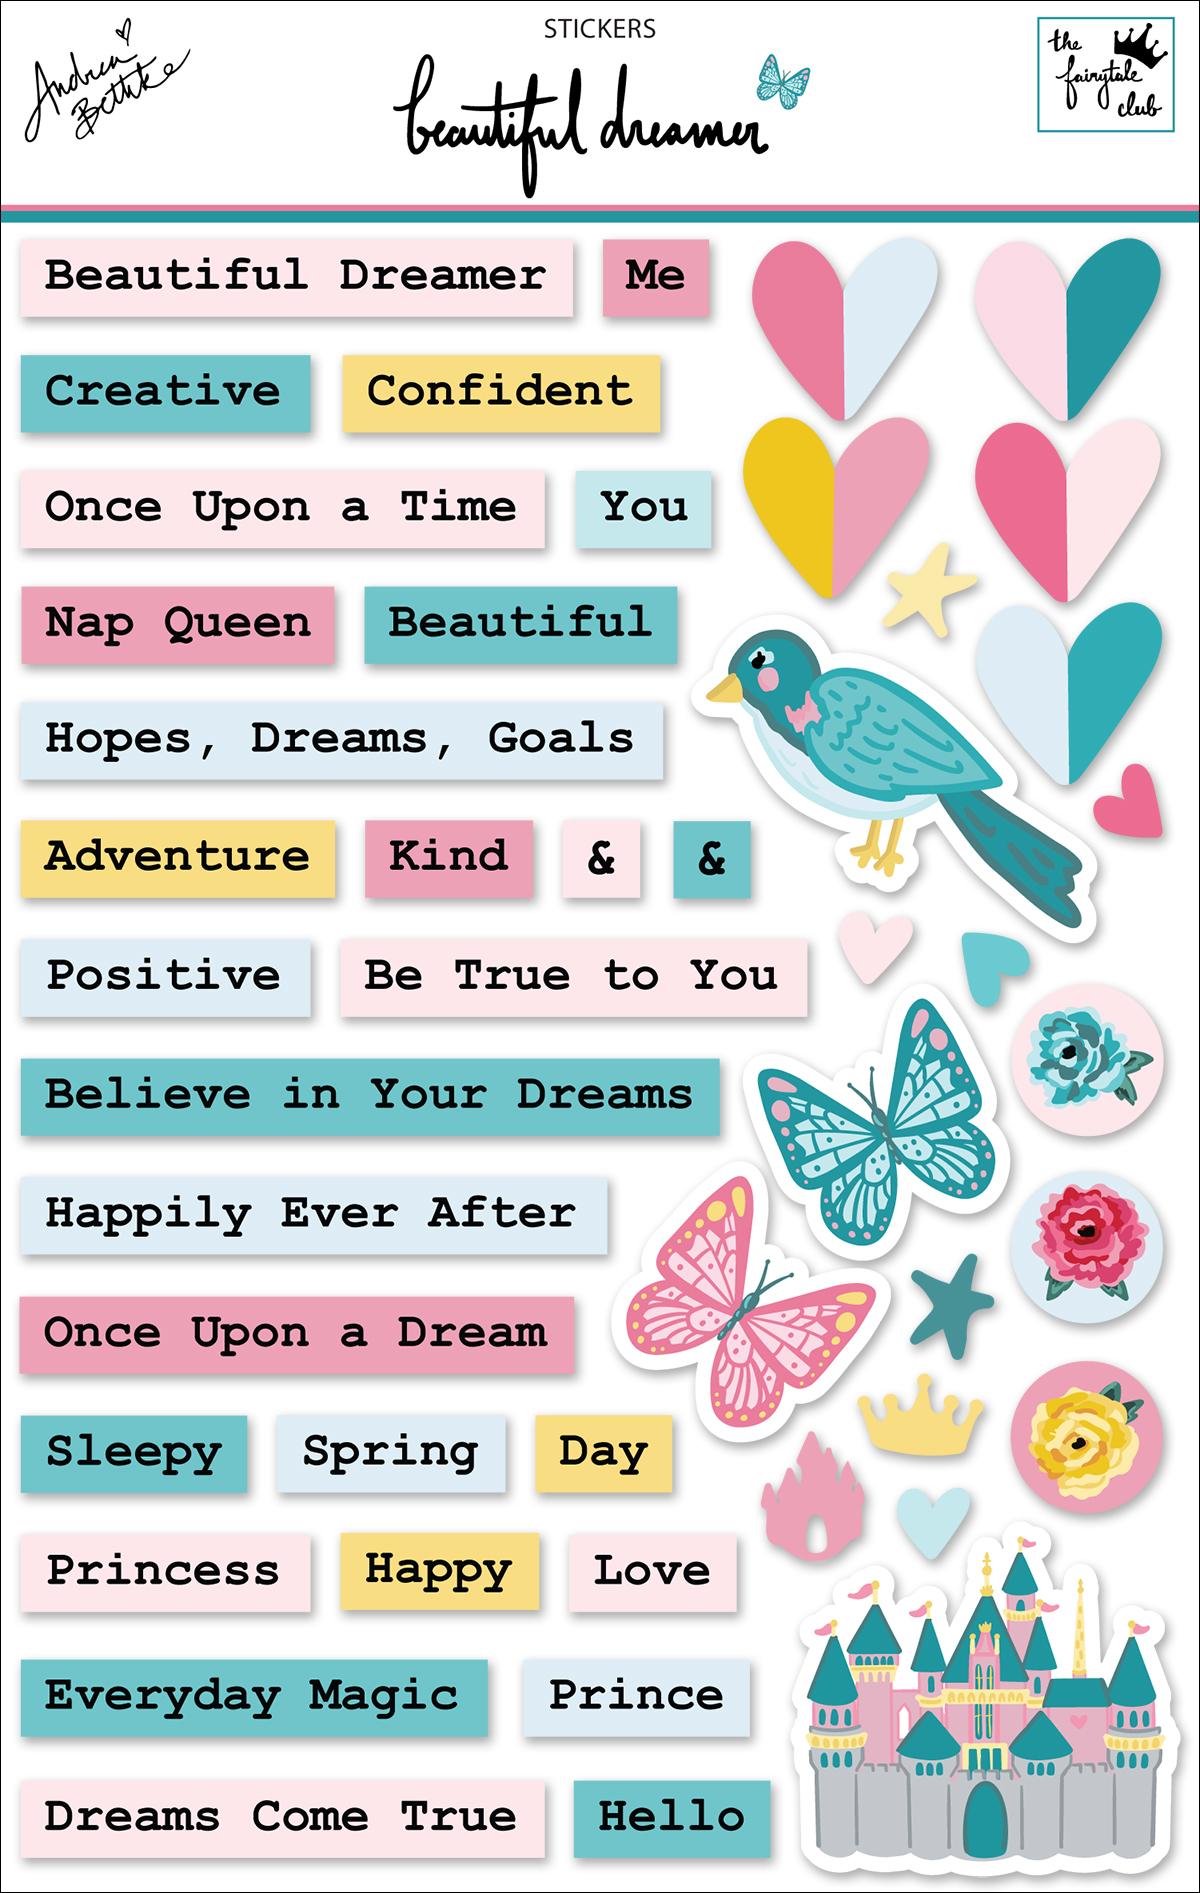 Beautiful Dreamer - Stickers packaging.jpg